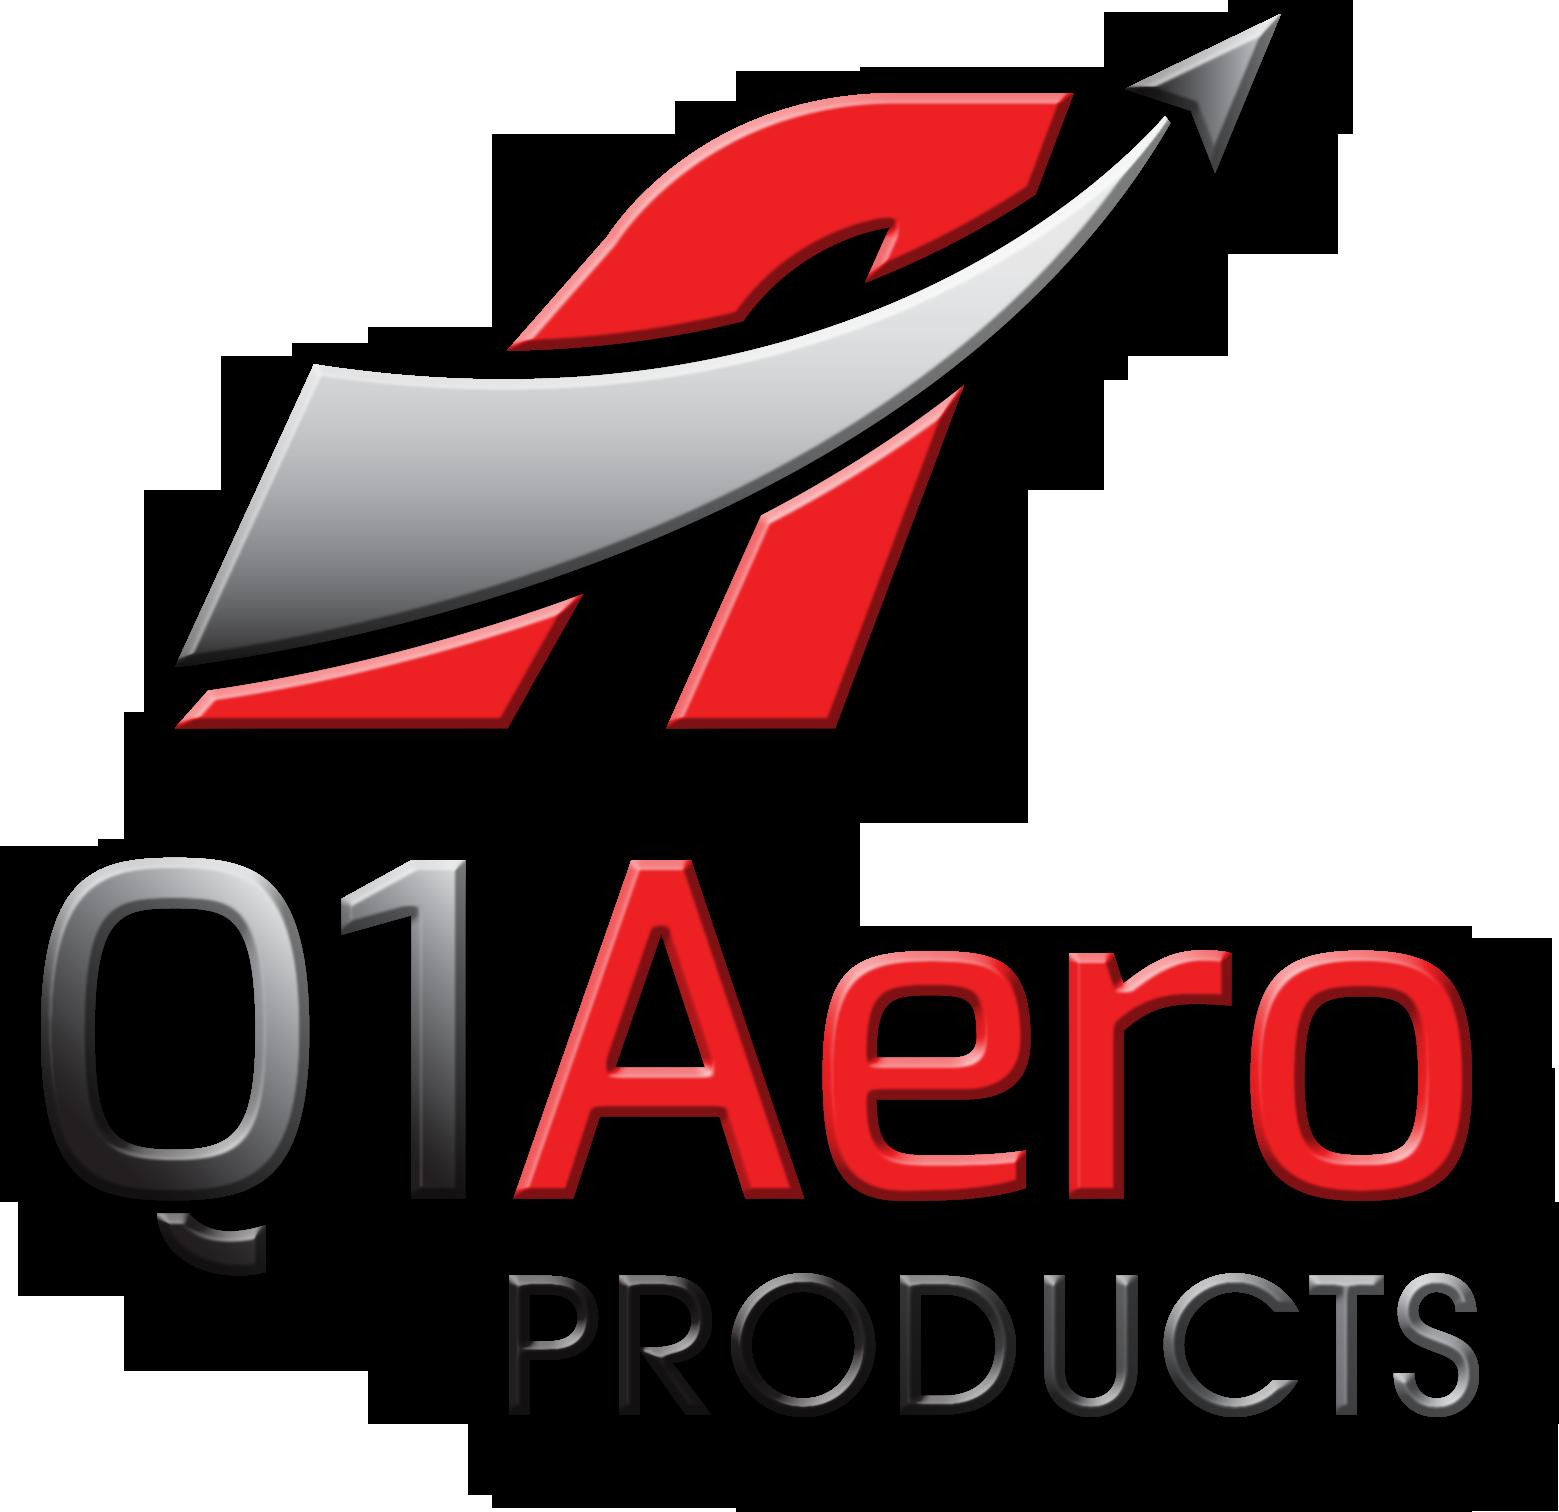 Q1 Aero Products